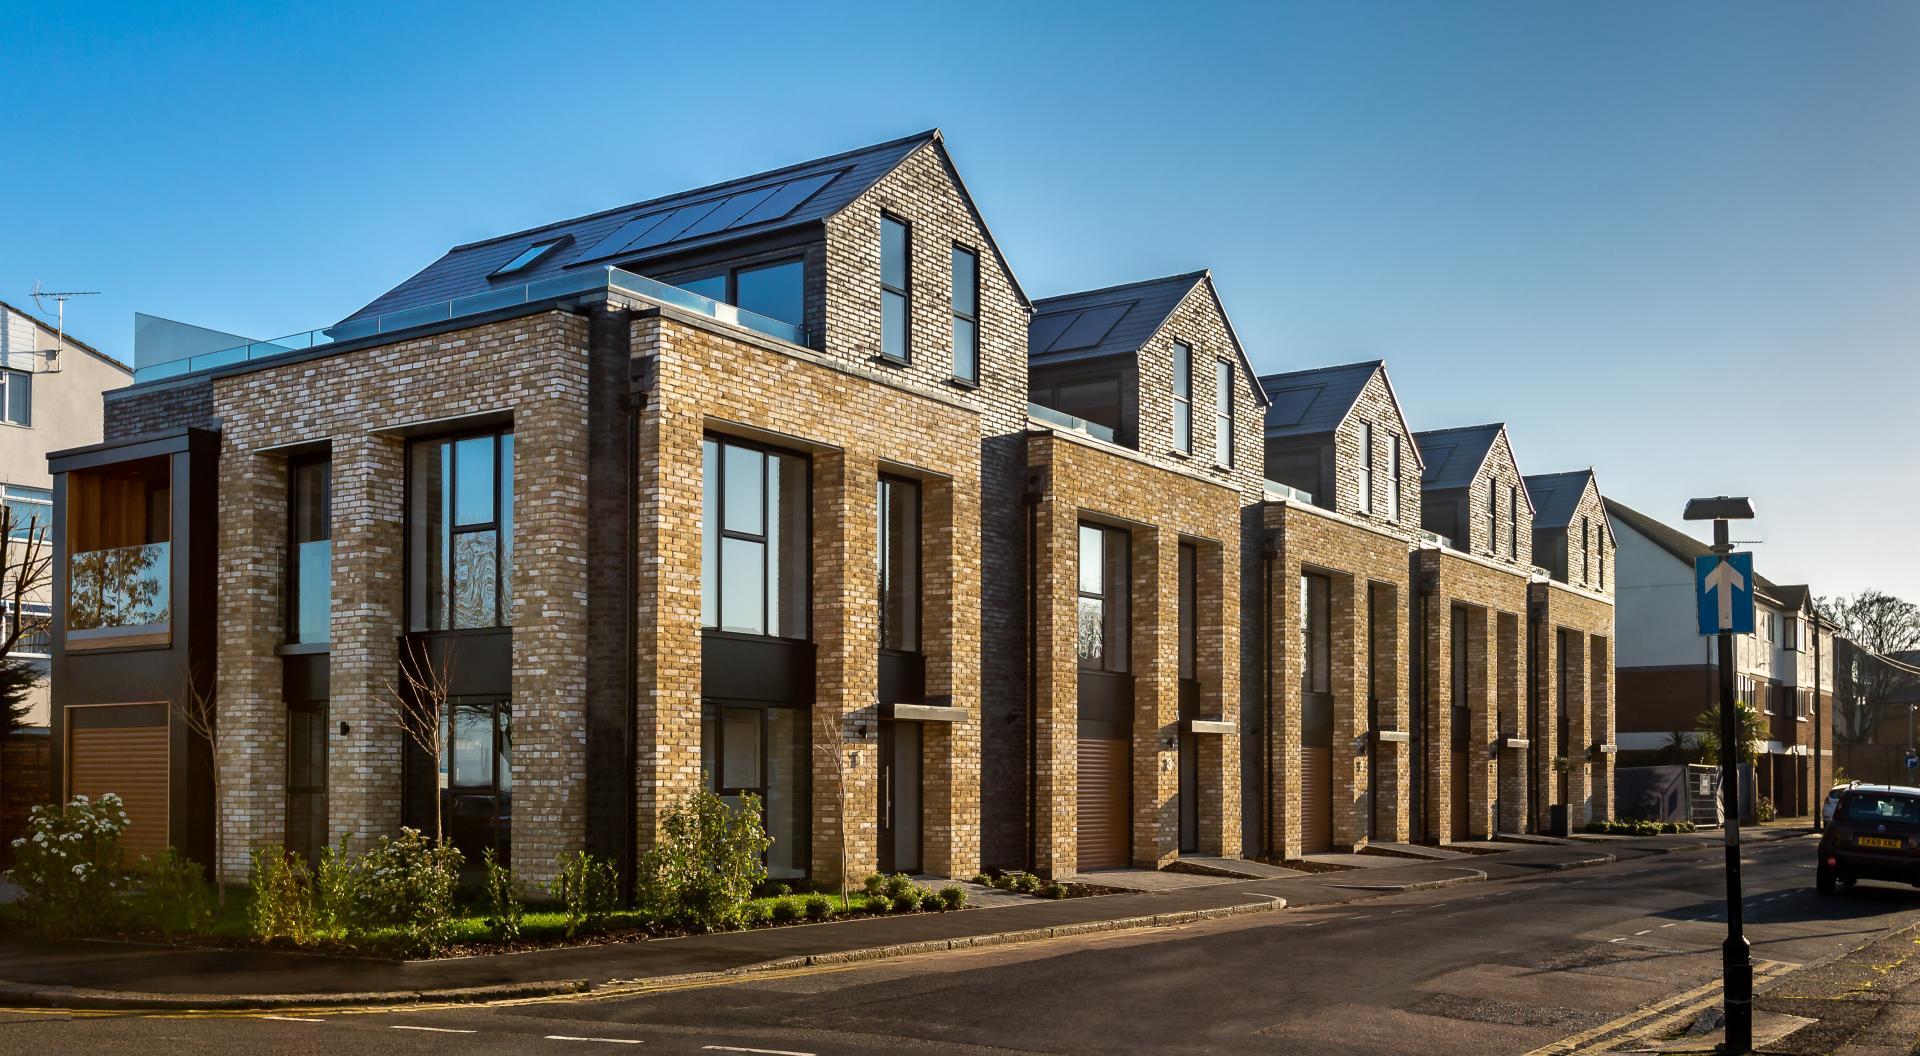 Exterior of new developement in Essex -